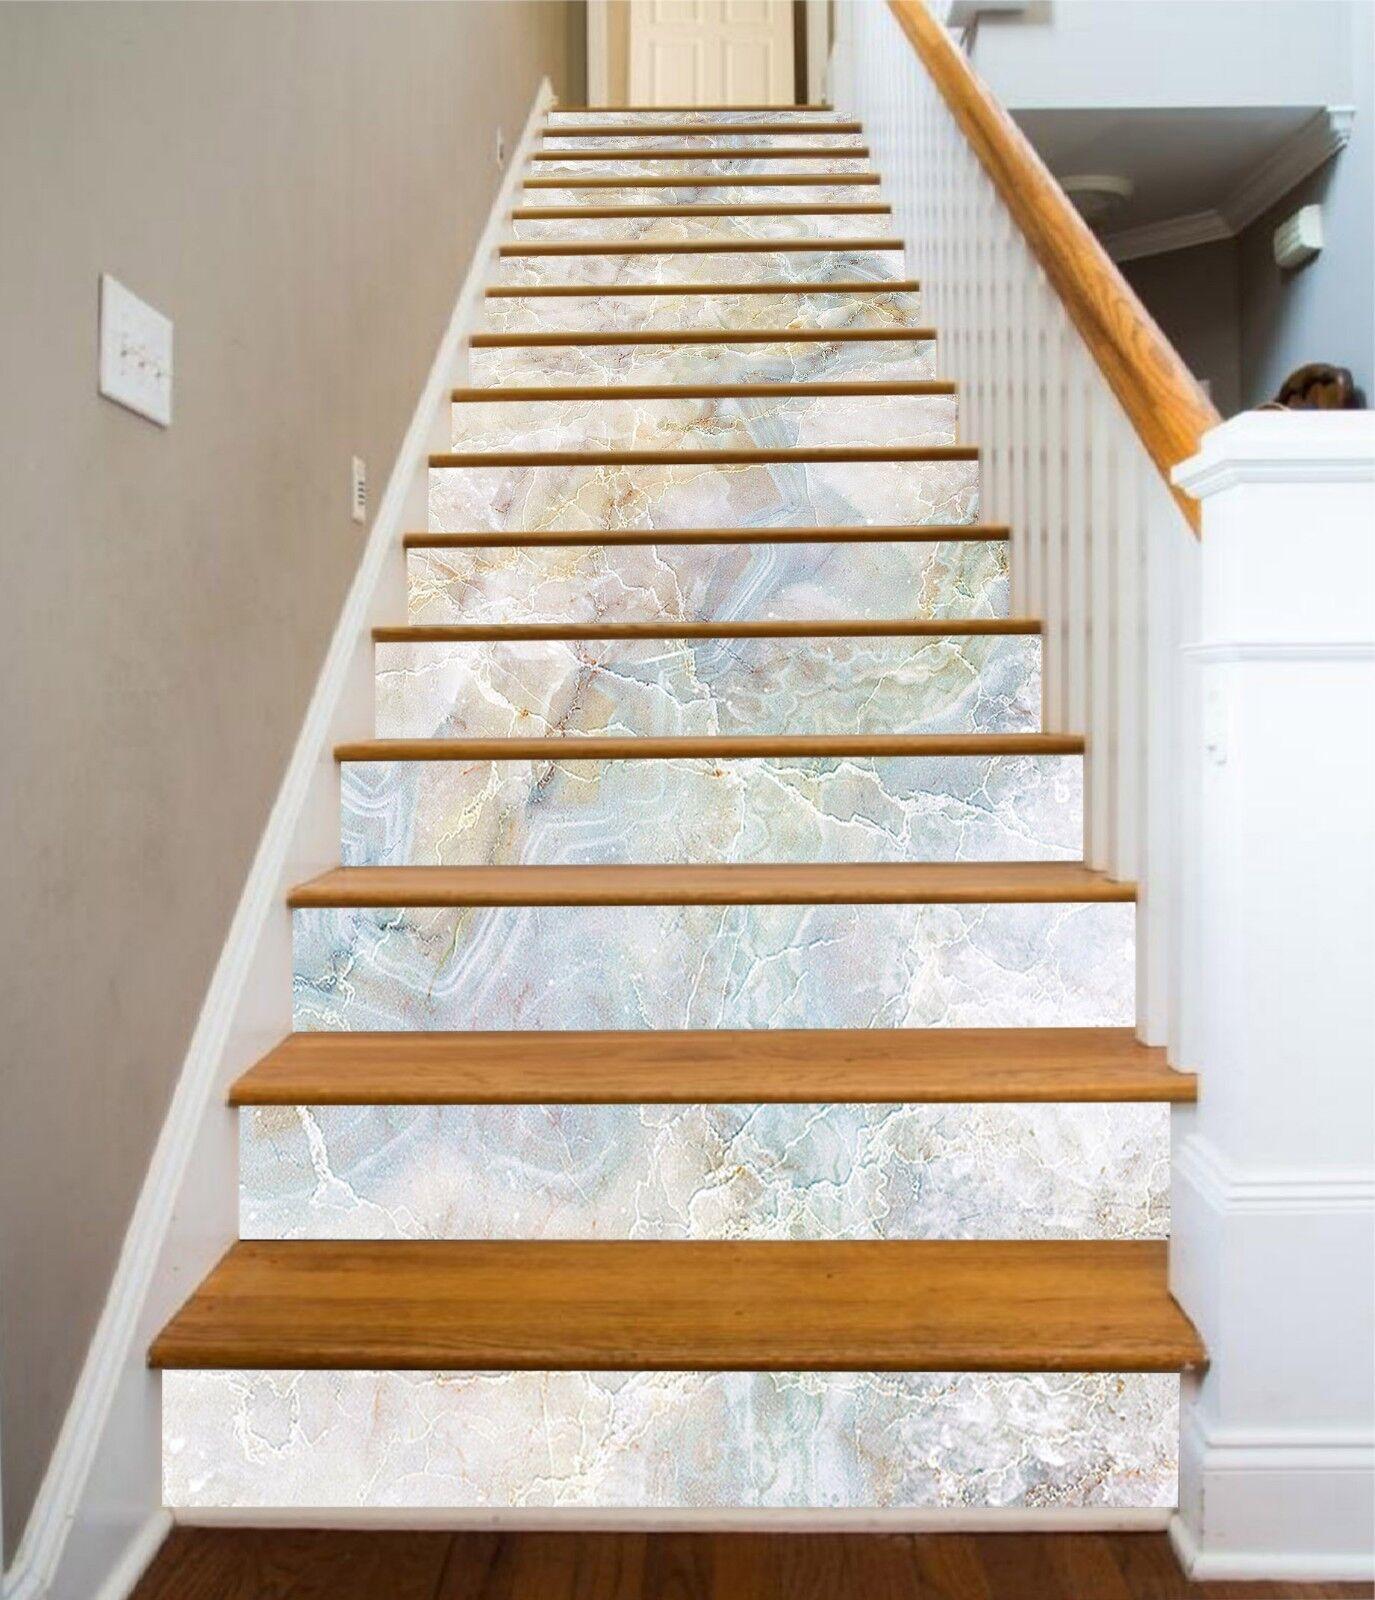 3D Cloud Shape 8 Tile Marble Stair Risers Photo Mural Vinyl Decal Wallpaper